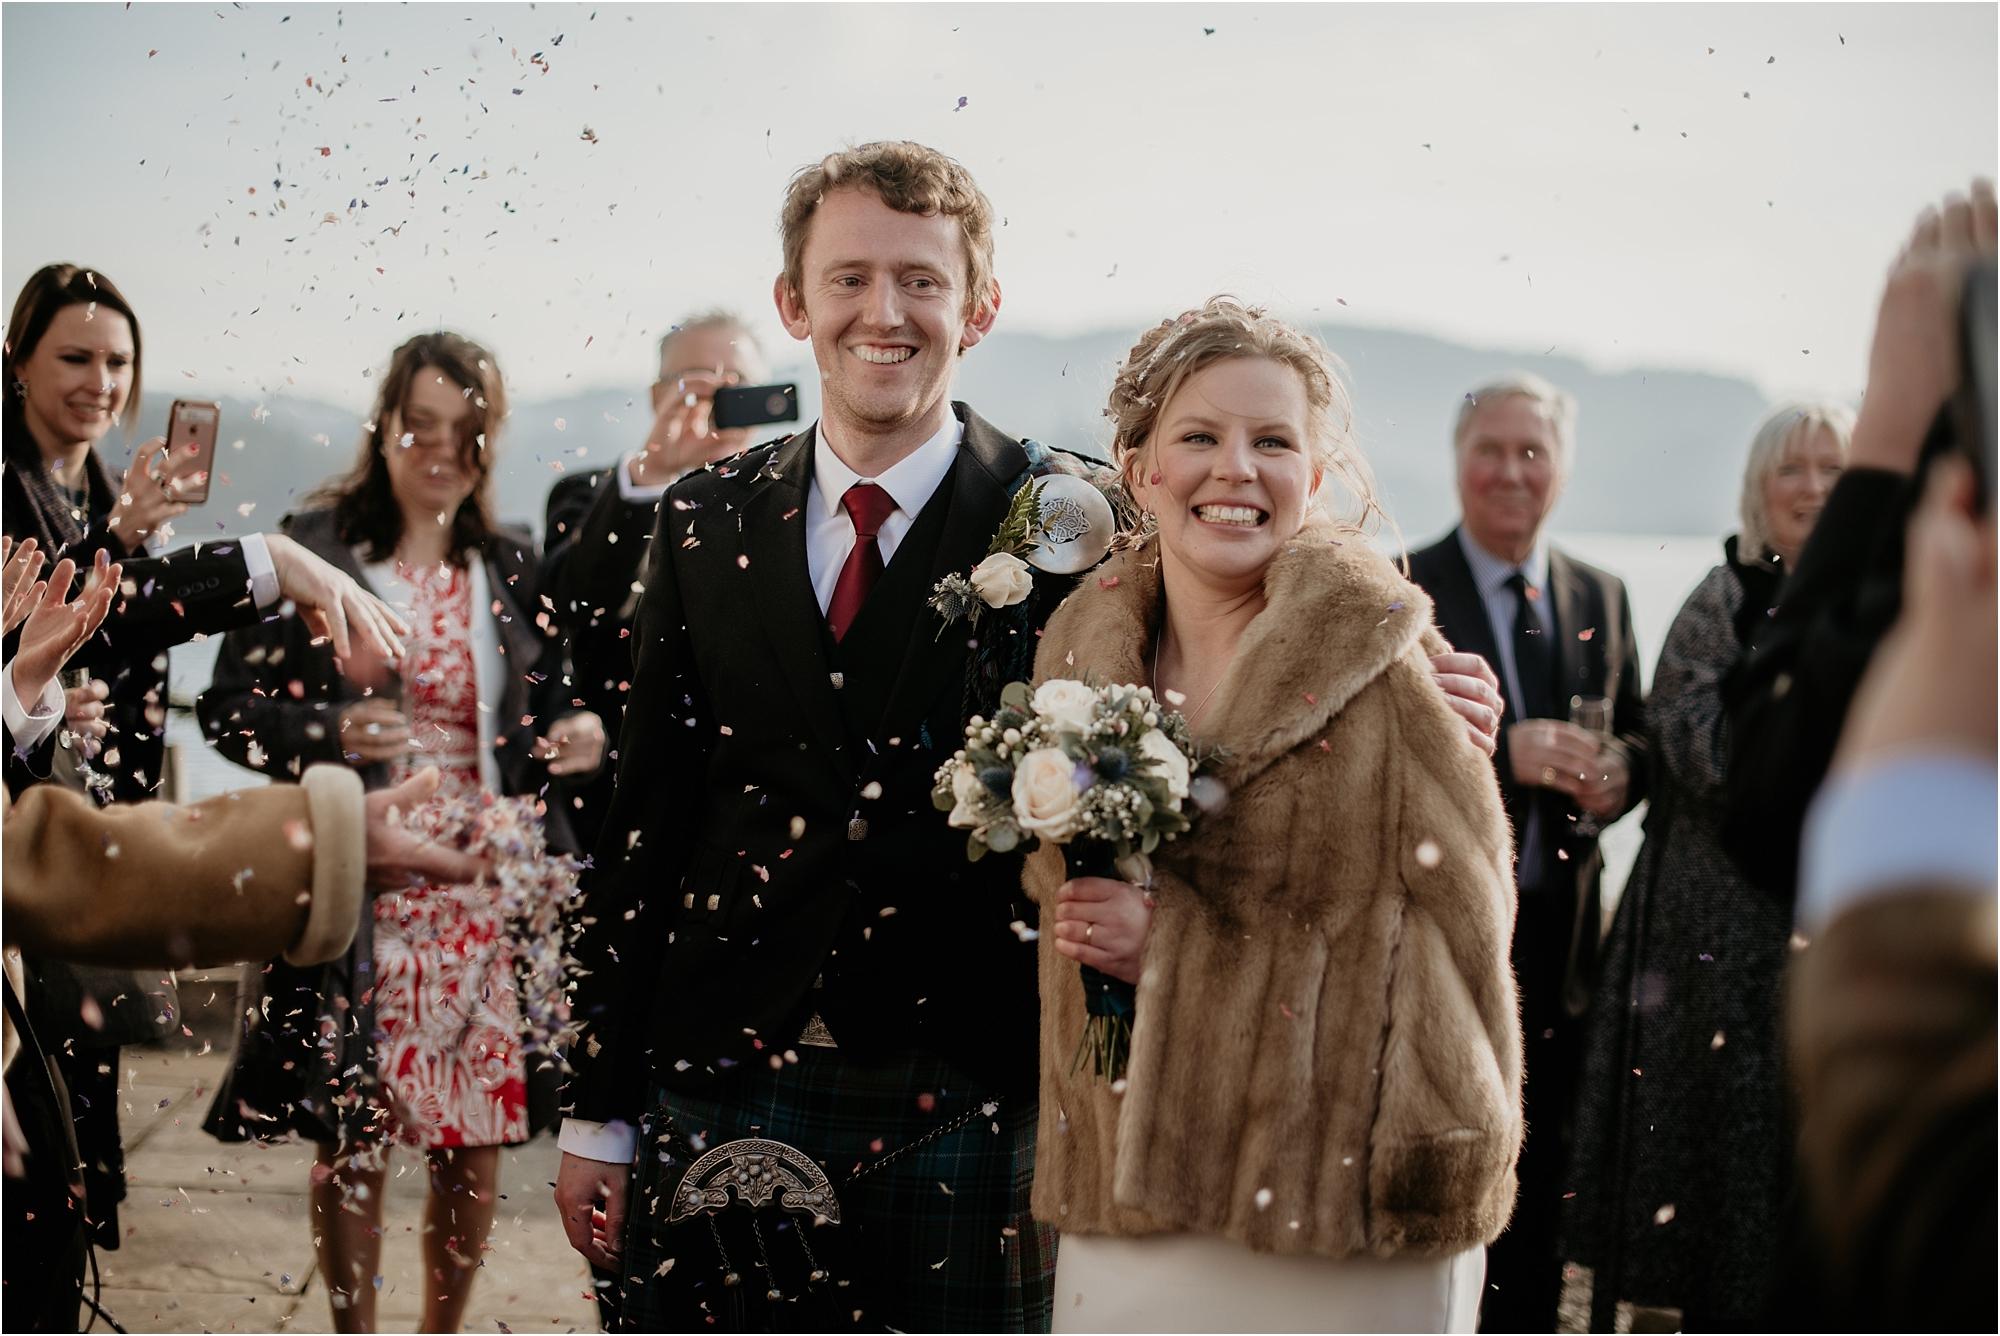 Kinlochard-village-hall-scottish-wedding-claire-fleck-photography__0068.jpg